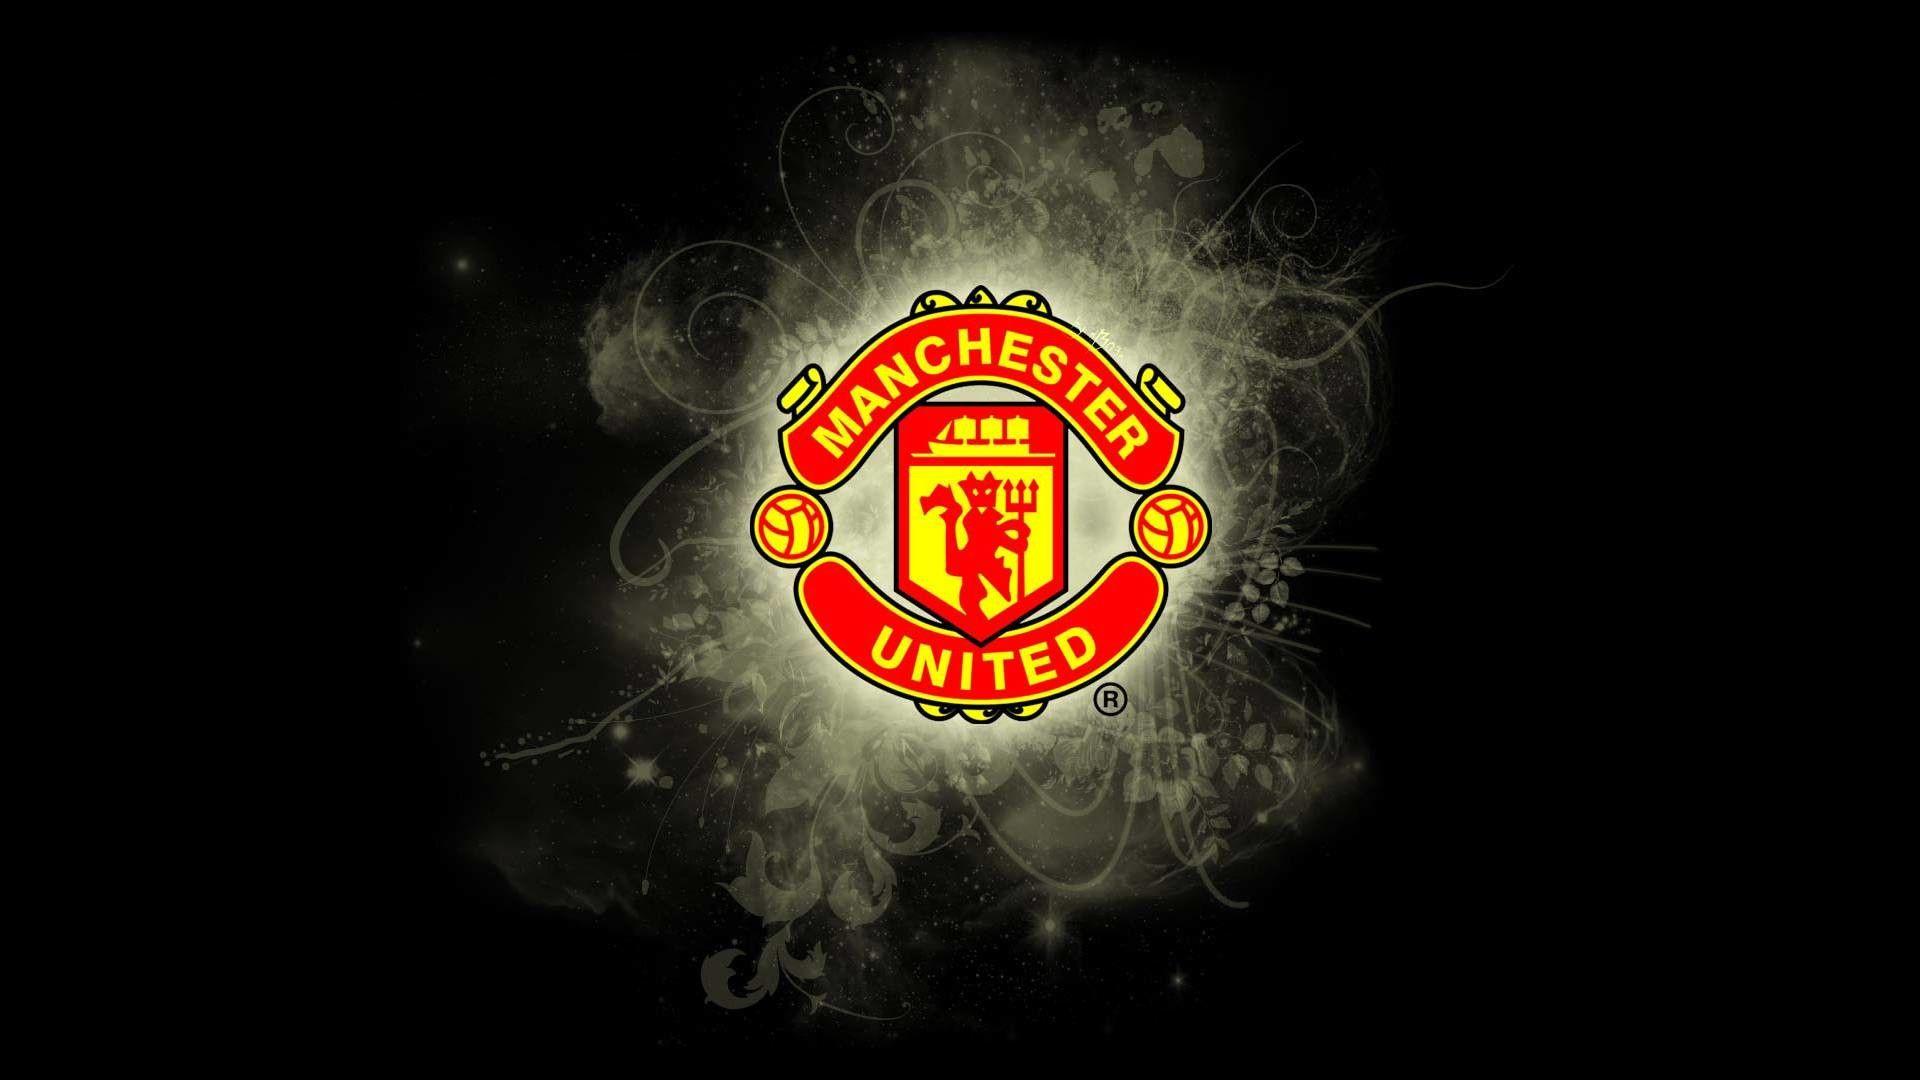 Manchester United Macbook Wallpaper Hd Football In 2020 Manchester United Wallpaper Manchester United Logo Logo Wallpaper Hd